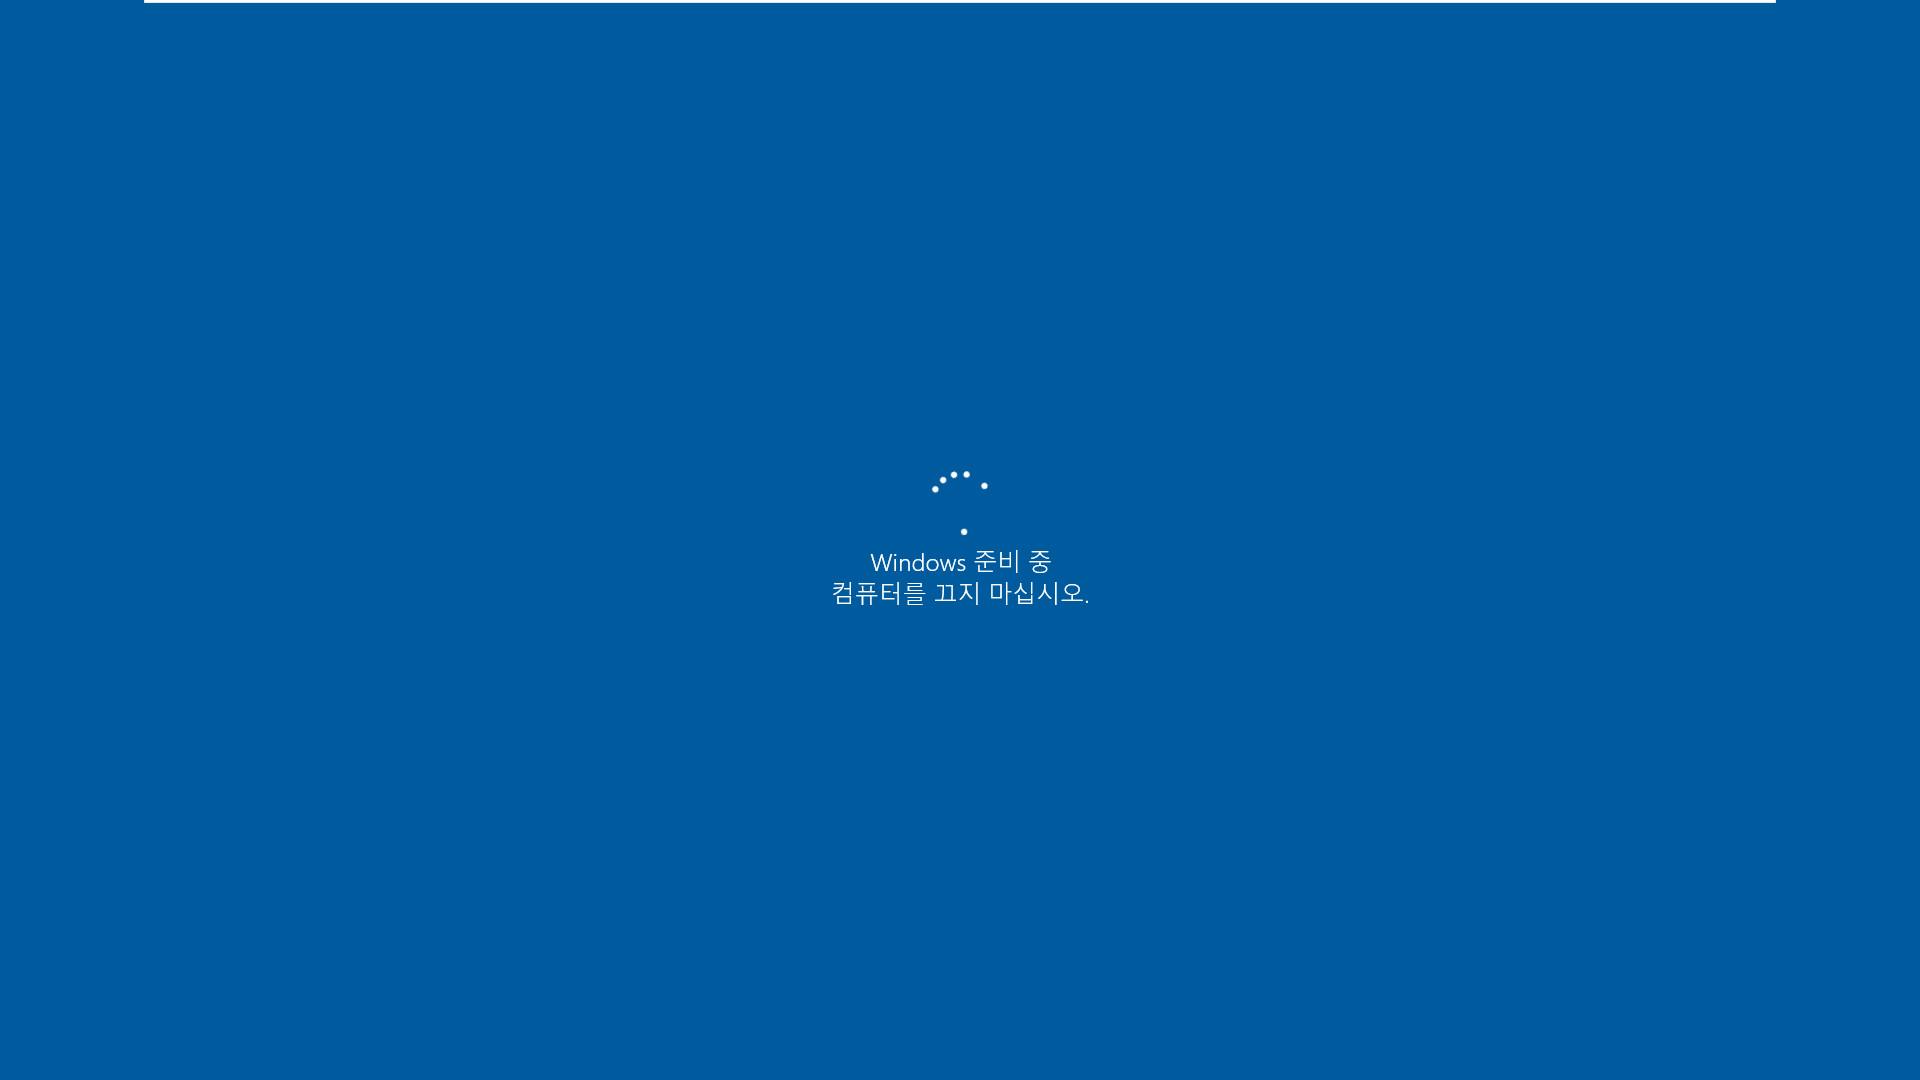 Windows 10 버전 1903 (OS빌드 18362.10022)에서 버전 1909 (OS빌드 18363.387) 으로 변경하기 테스트 2019-10-01_214457.jpg